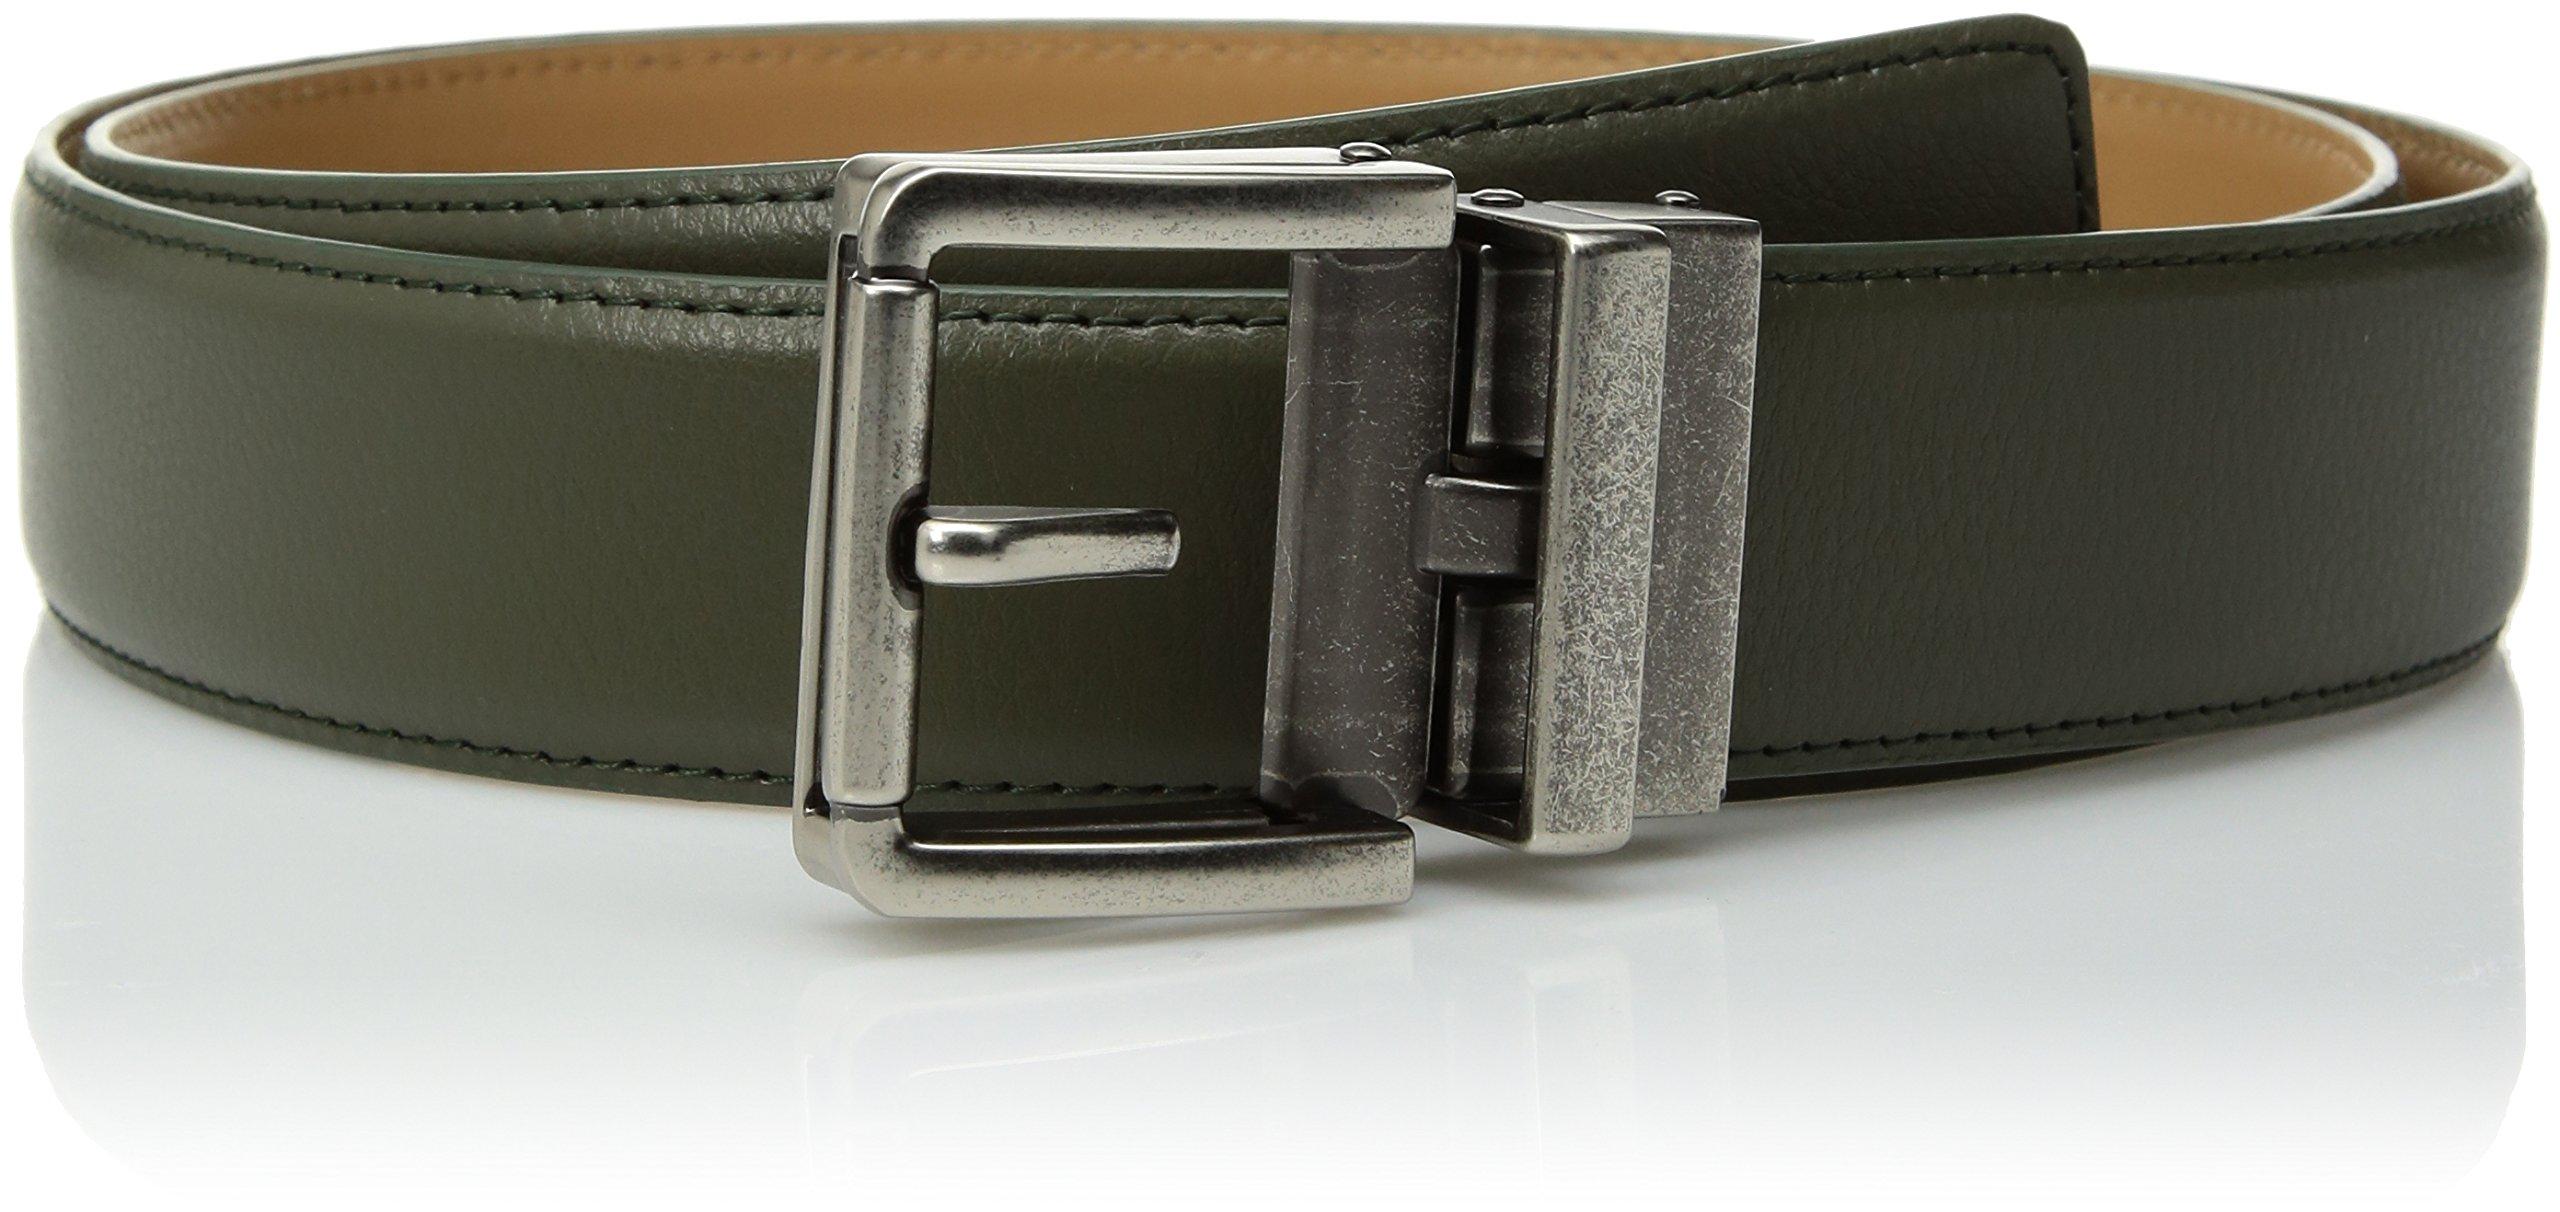 Comfort Click Men's Adjustable Perfect Fit Ratchet Belt-As Seen on TV, Olive/Tarnished Gunmetal-Pebble, ONE SIZE